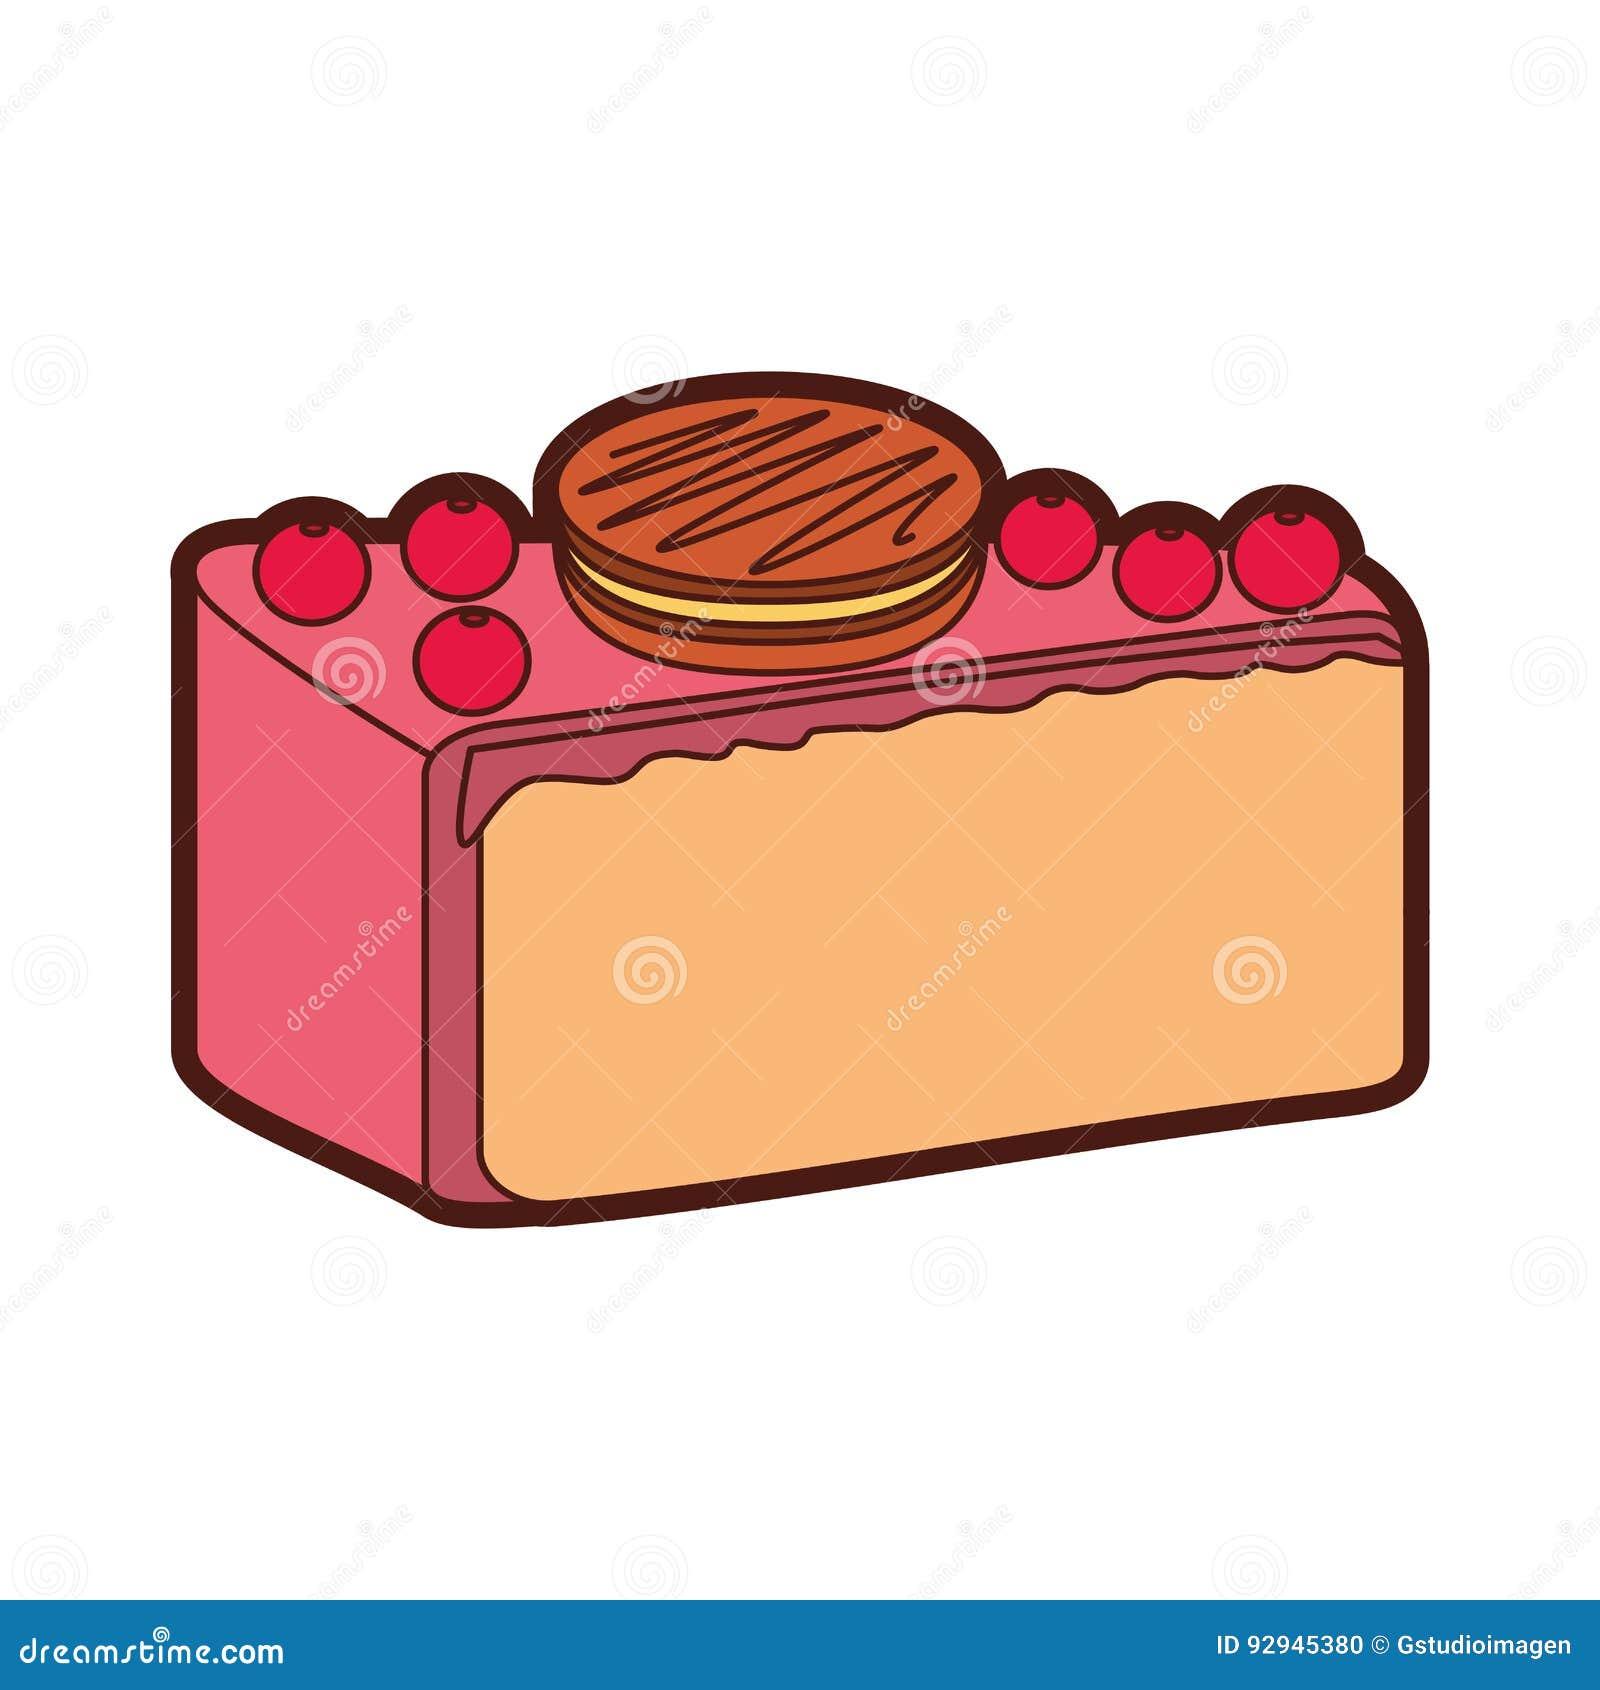 30c5c63d0d3a Yummy Sweet Cake Slide Piece Stock Vector - Illustration of design ...